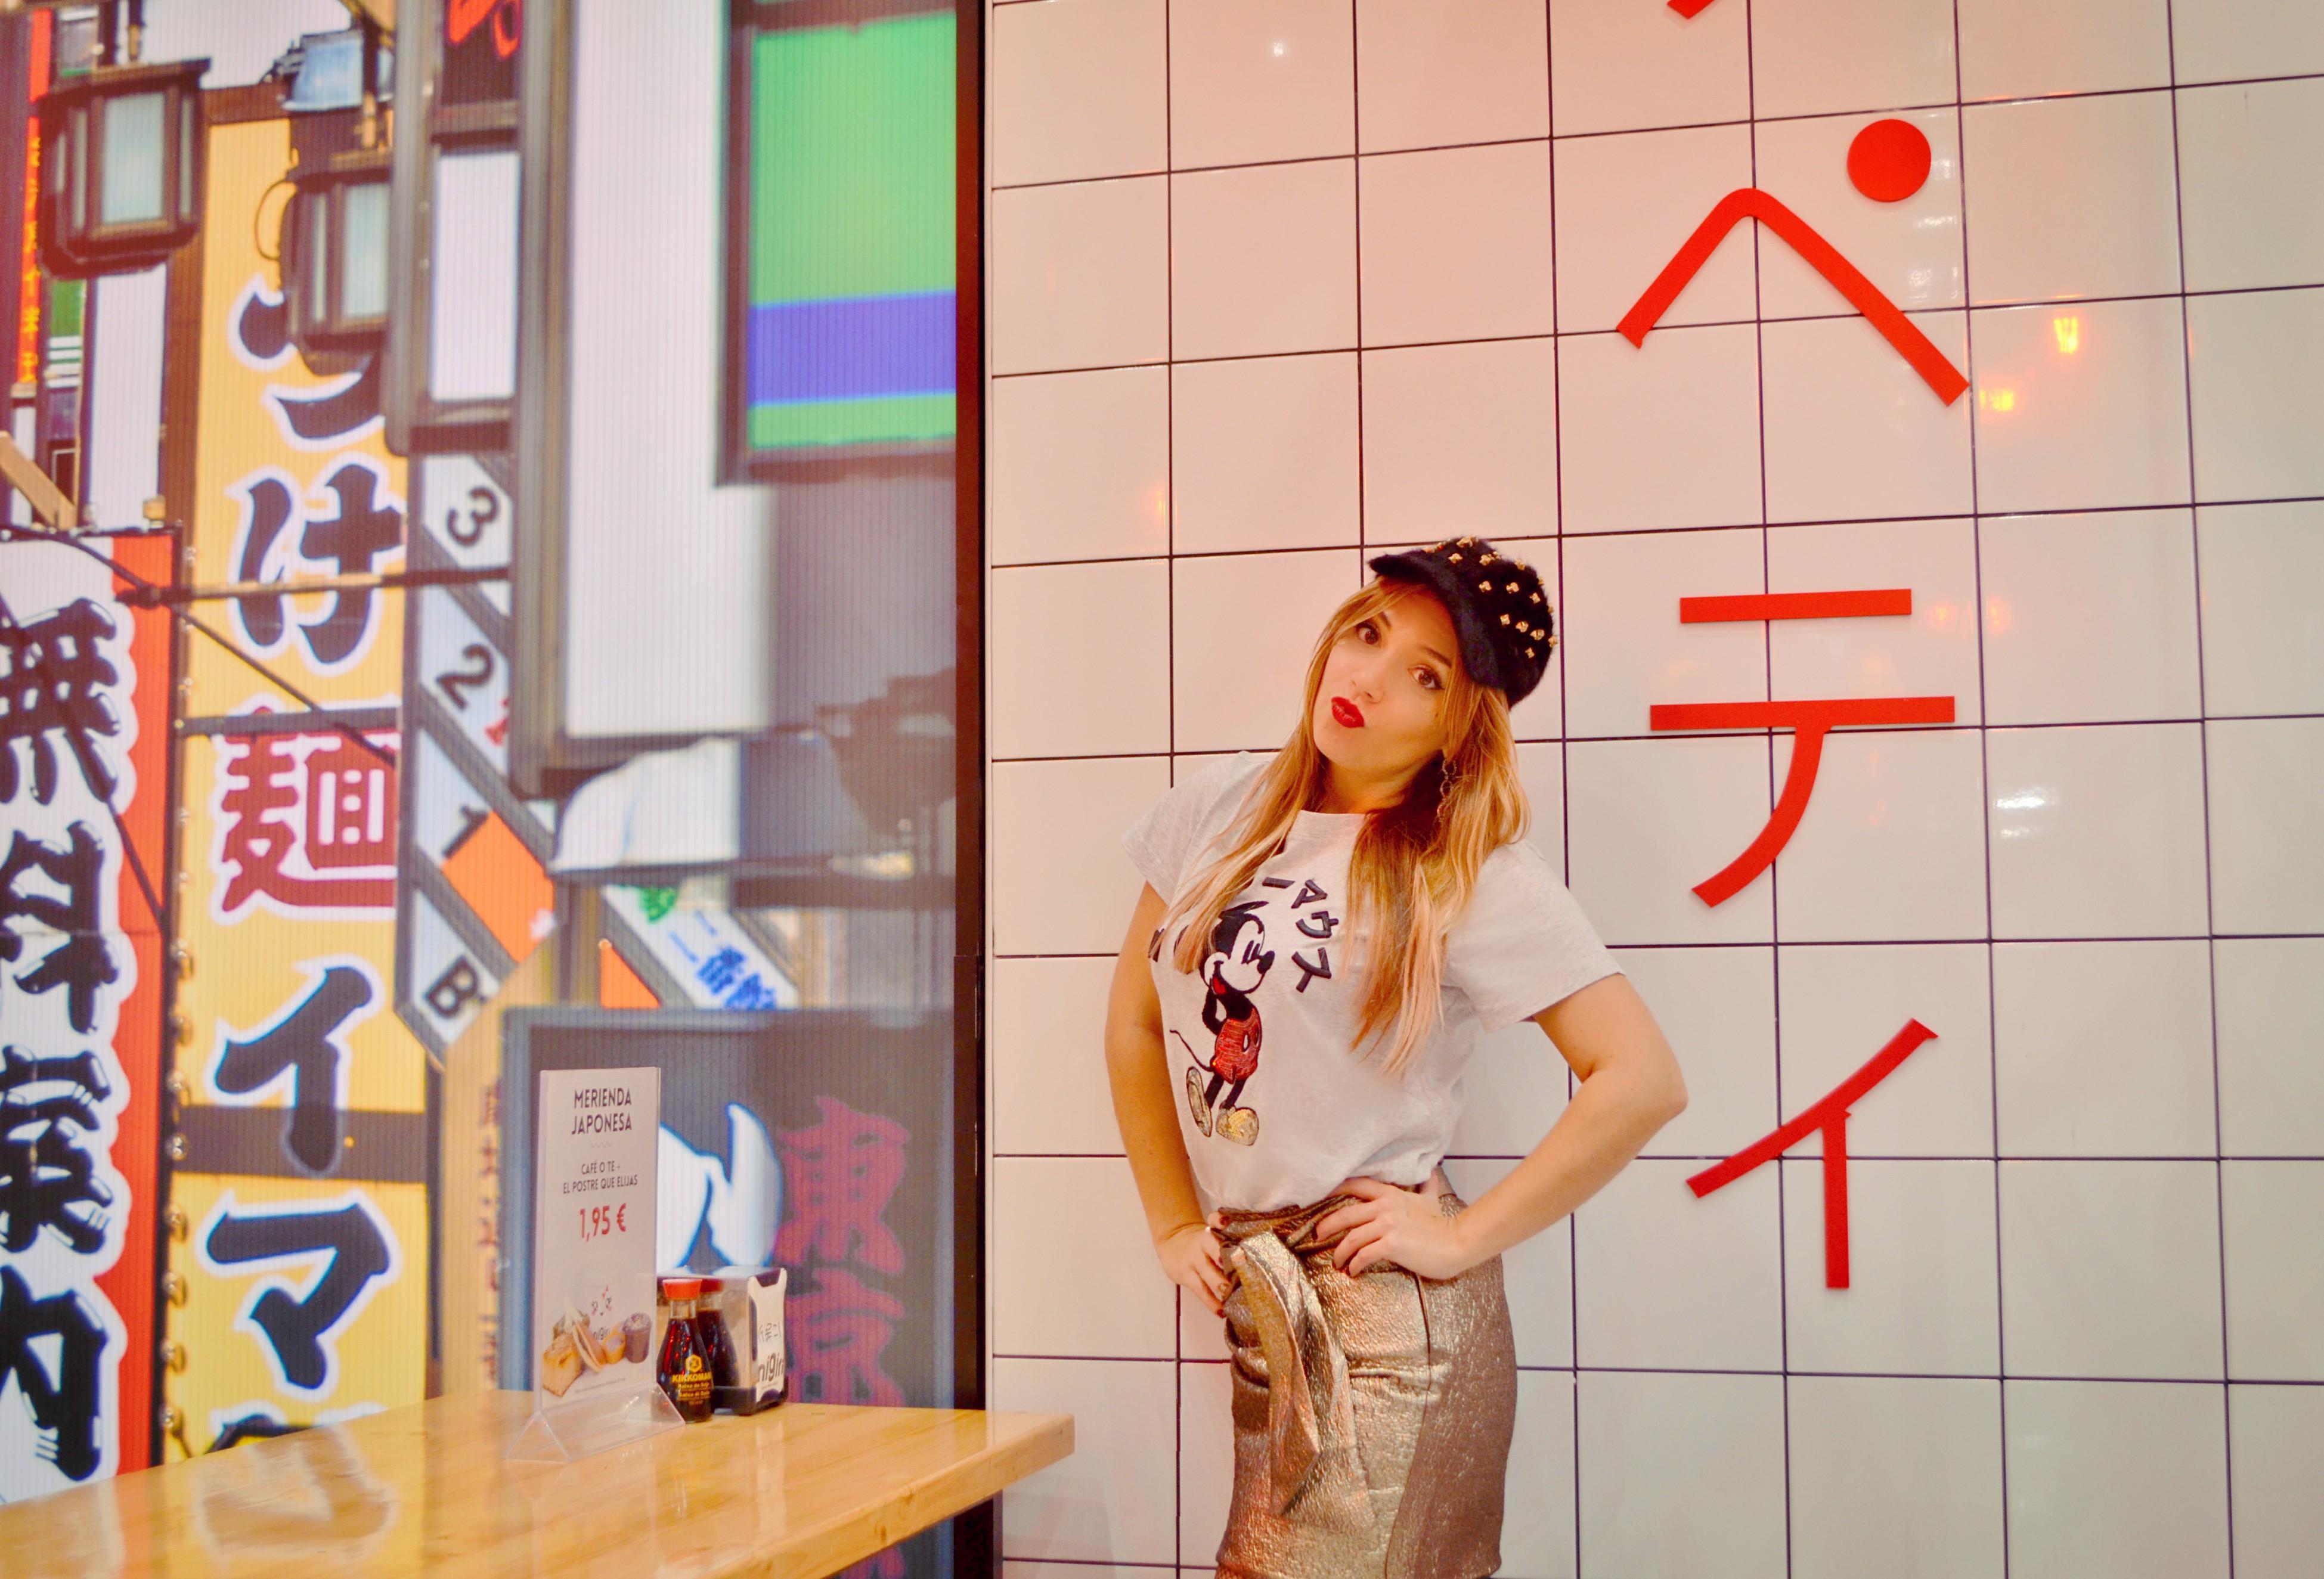 Blog-de-moda-ChicAdicta-influencer-Nigiri-Madrid-Chic-Adicta-look-falda-dorada-camiseta-mickey-mango-PiensaenChic-Piensa-en-Chic